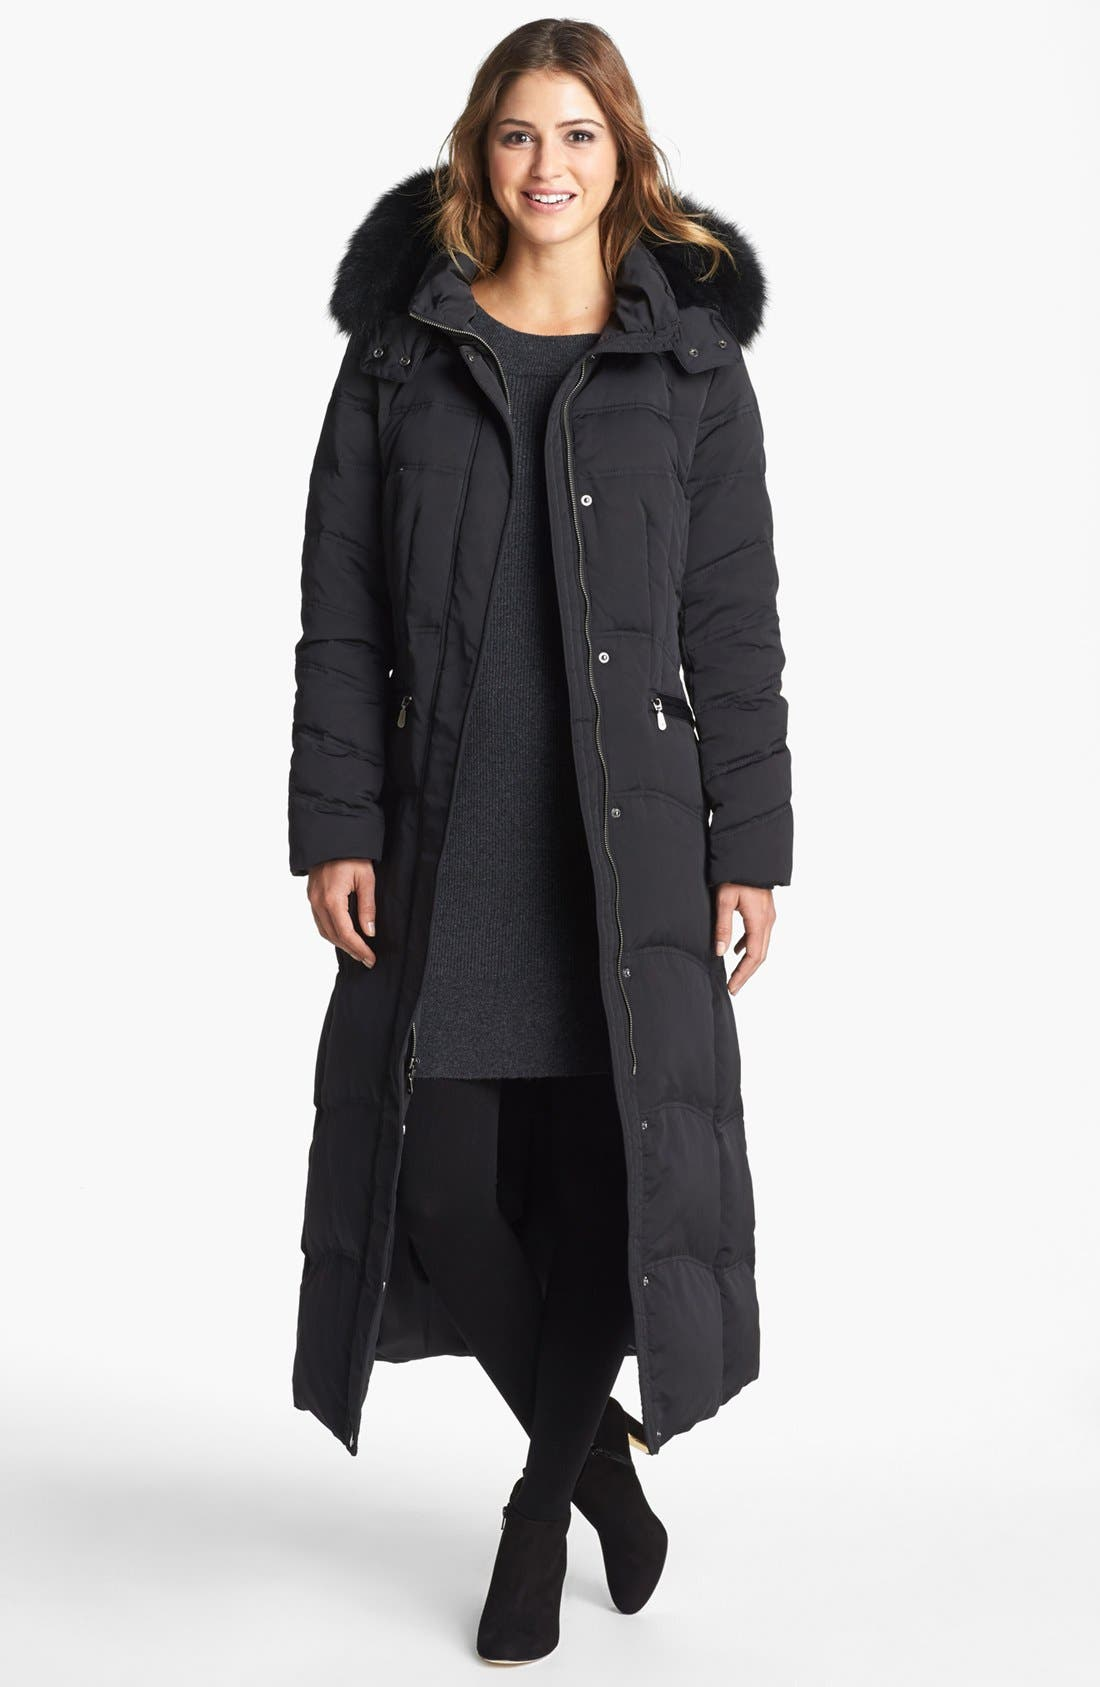 Alternate Image 1 Selected - 1 Madison Genuine Fox Fur Trim Long Down & Feather Coat